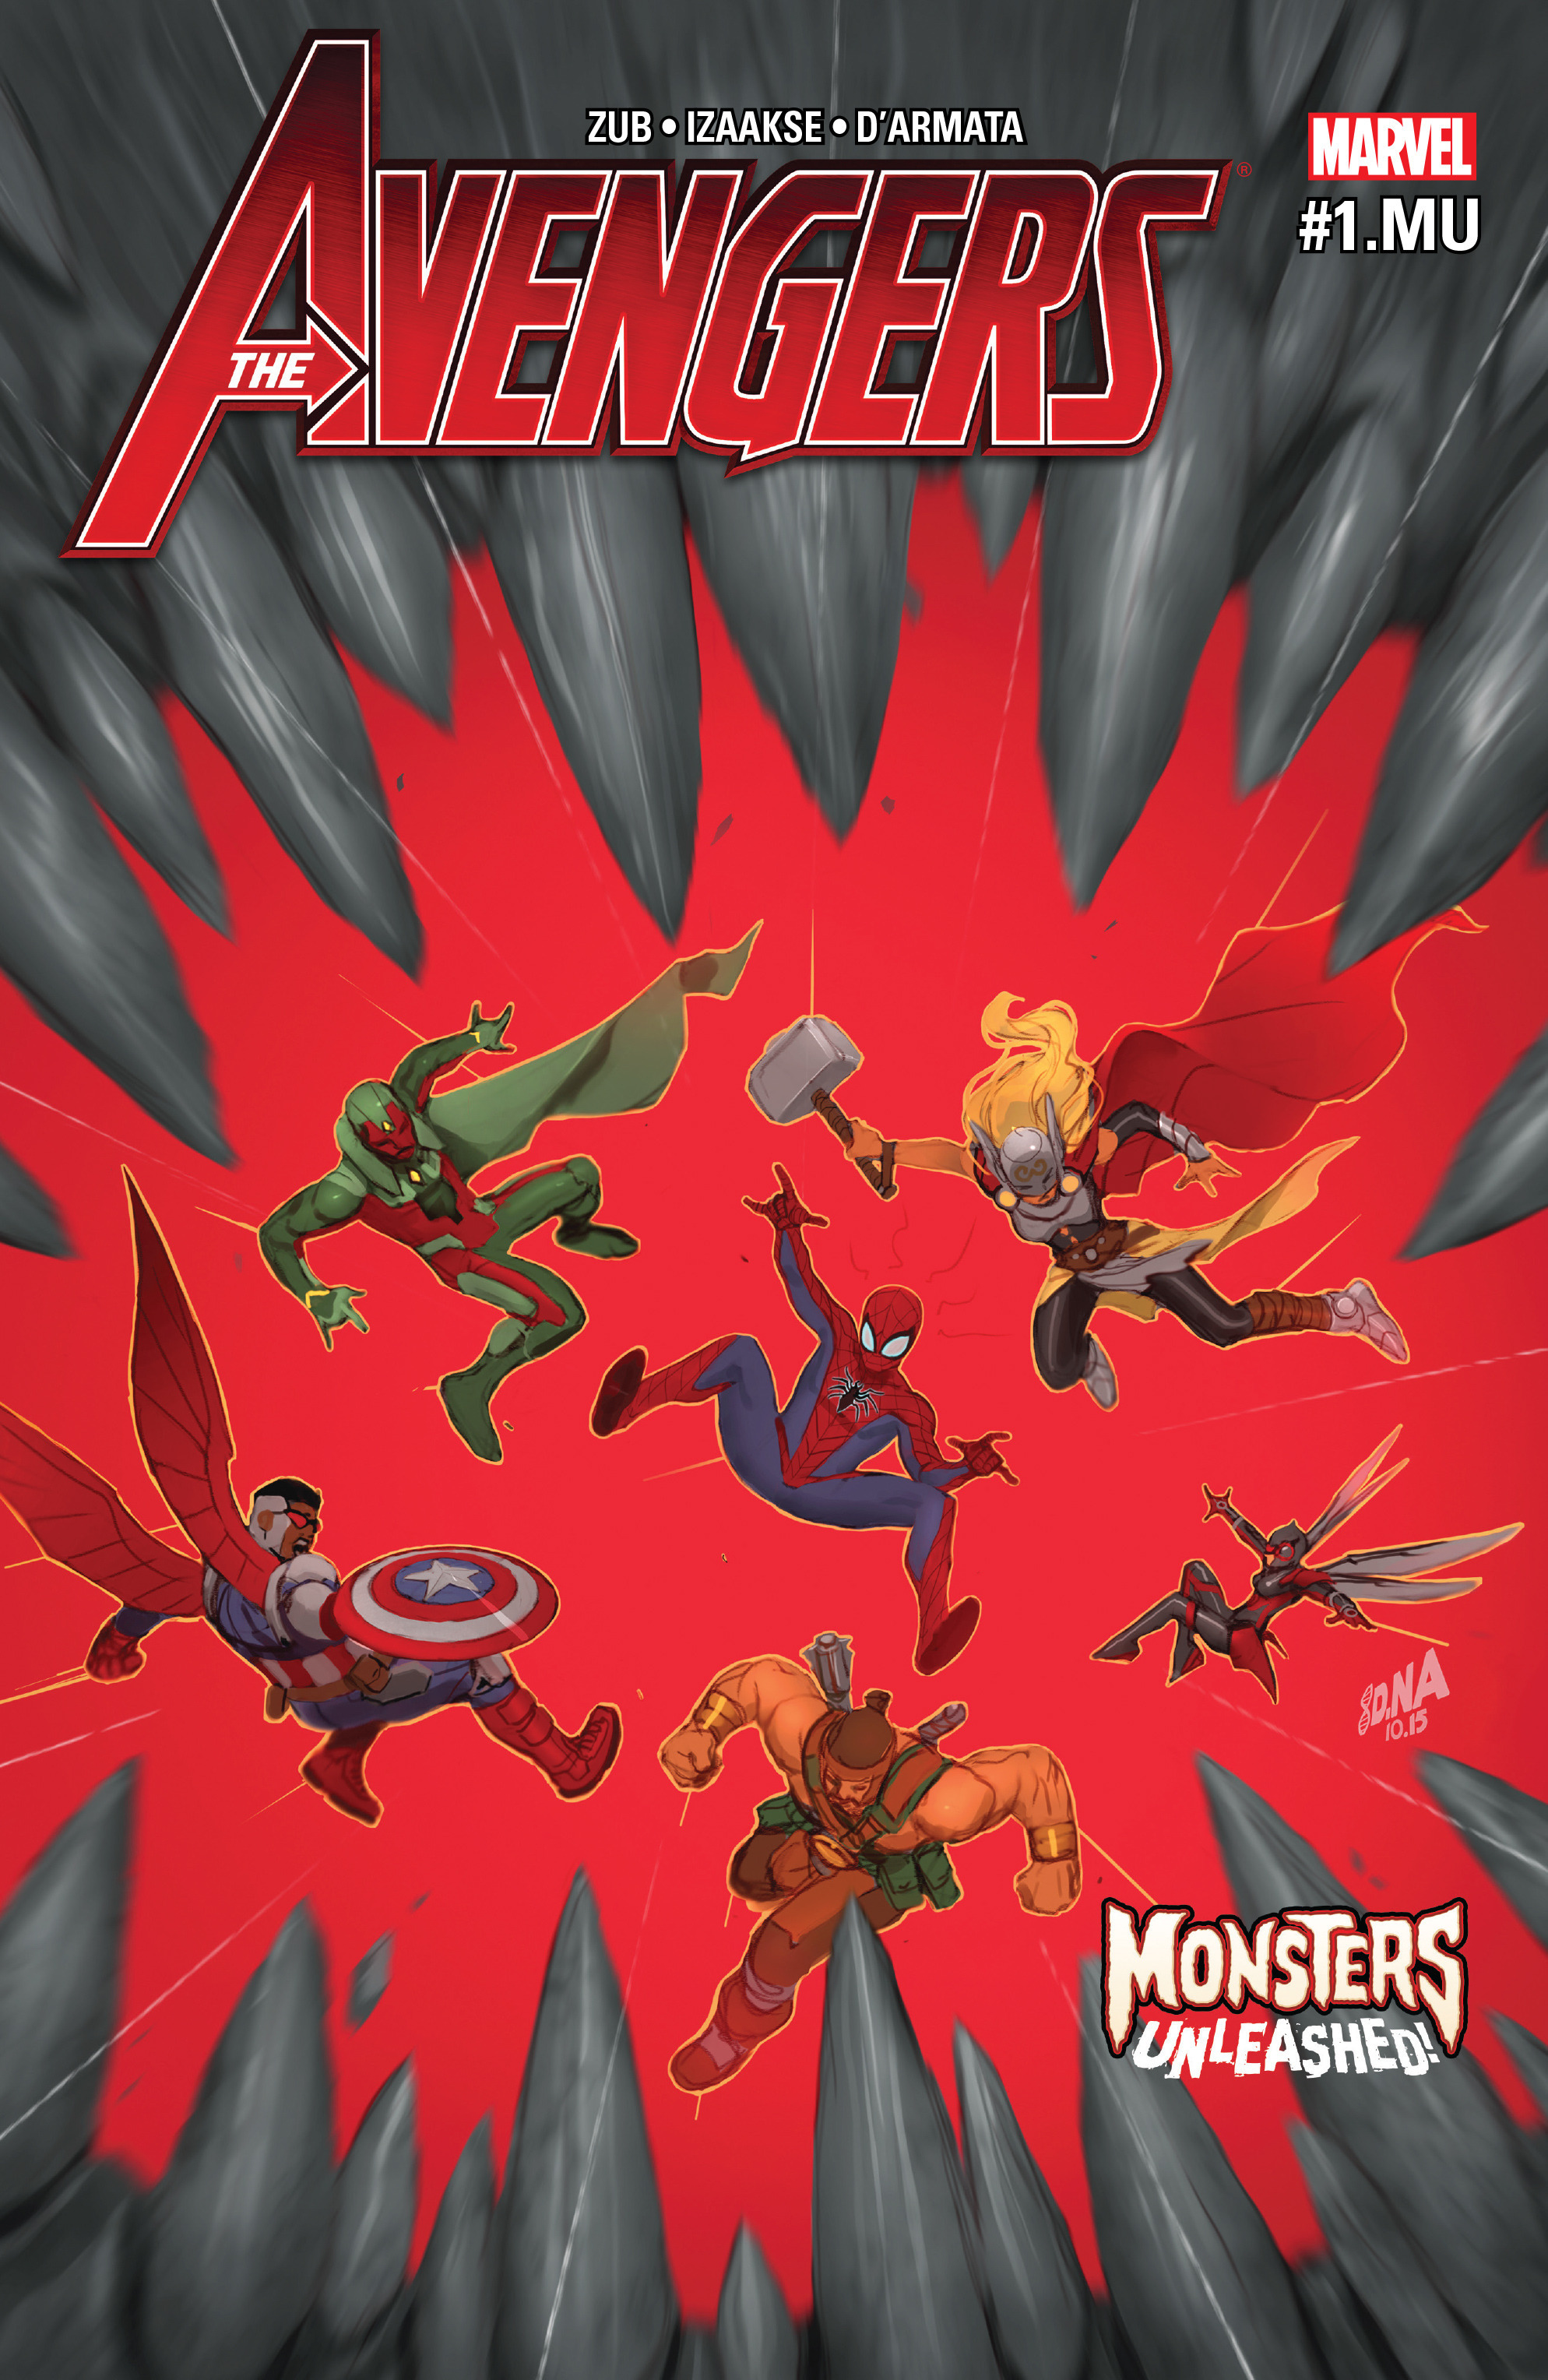 Read online Avengers (2016) comic -  Issue #1.MU - 1